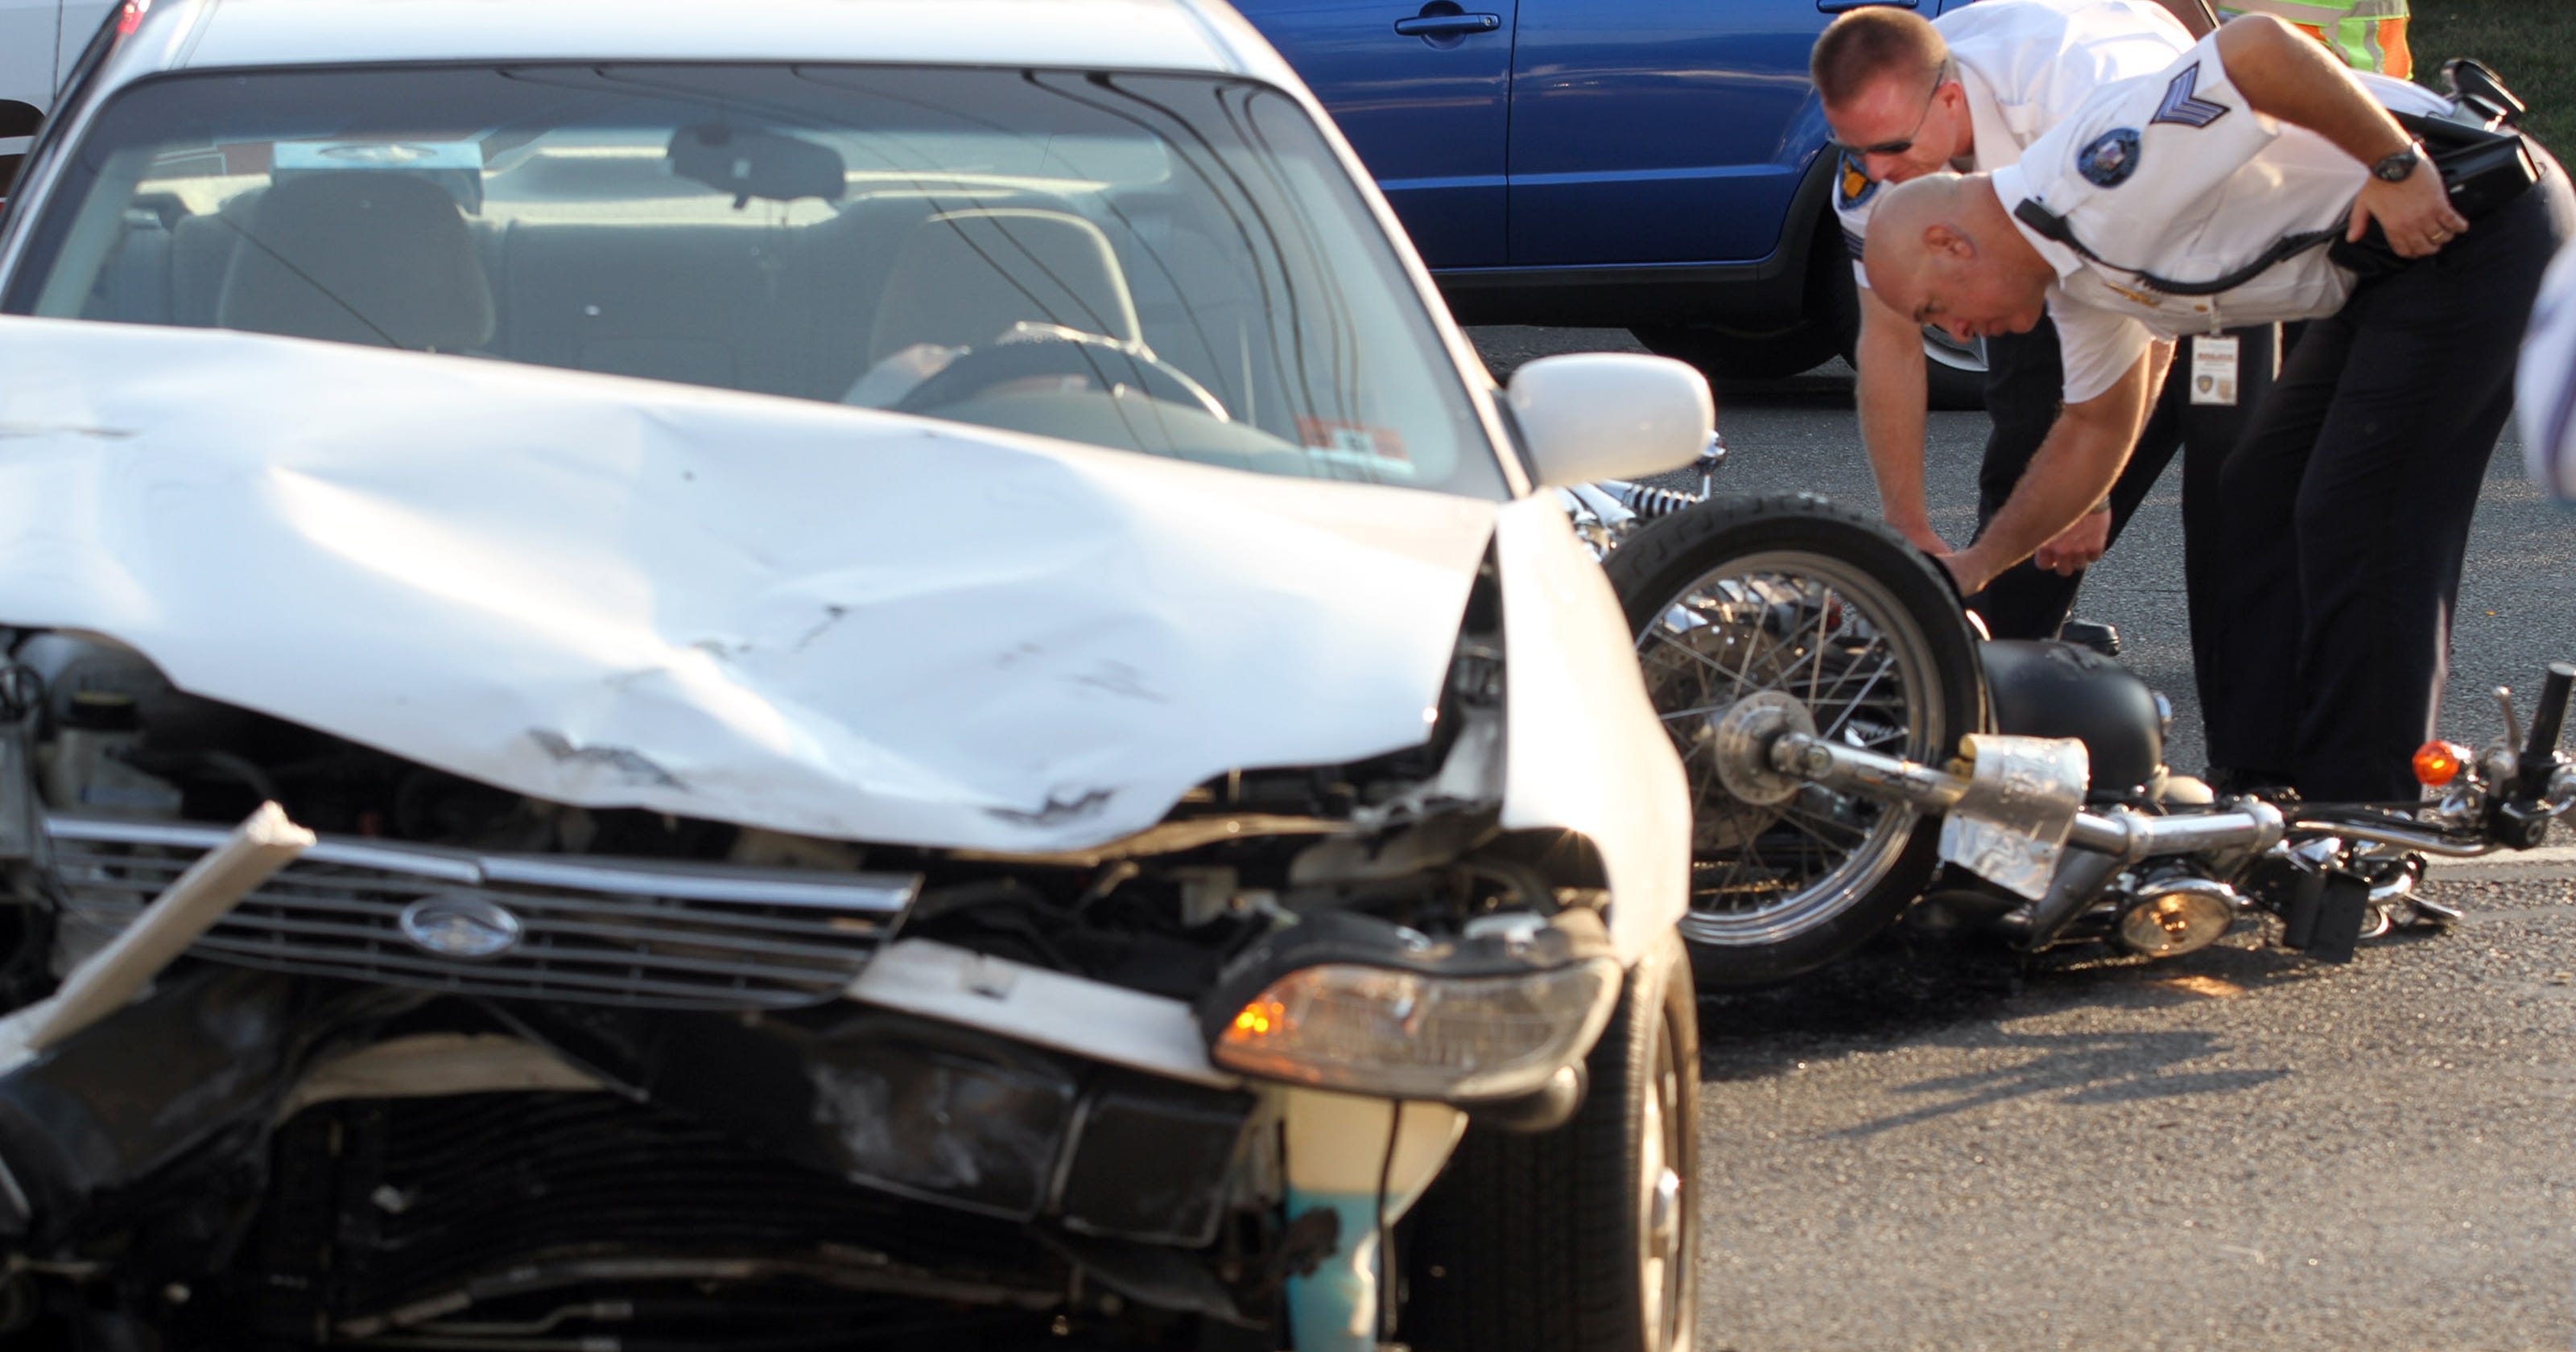 Nj Car Crash Yesterday